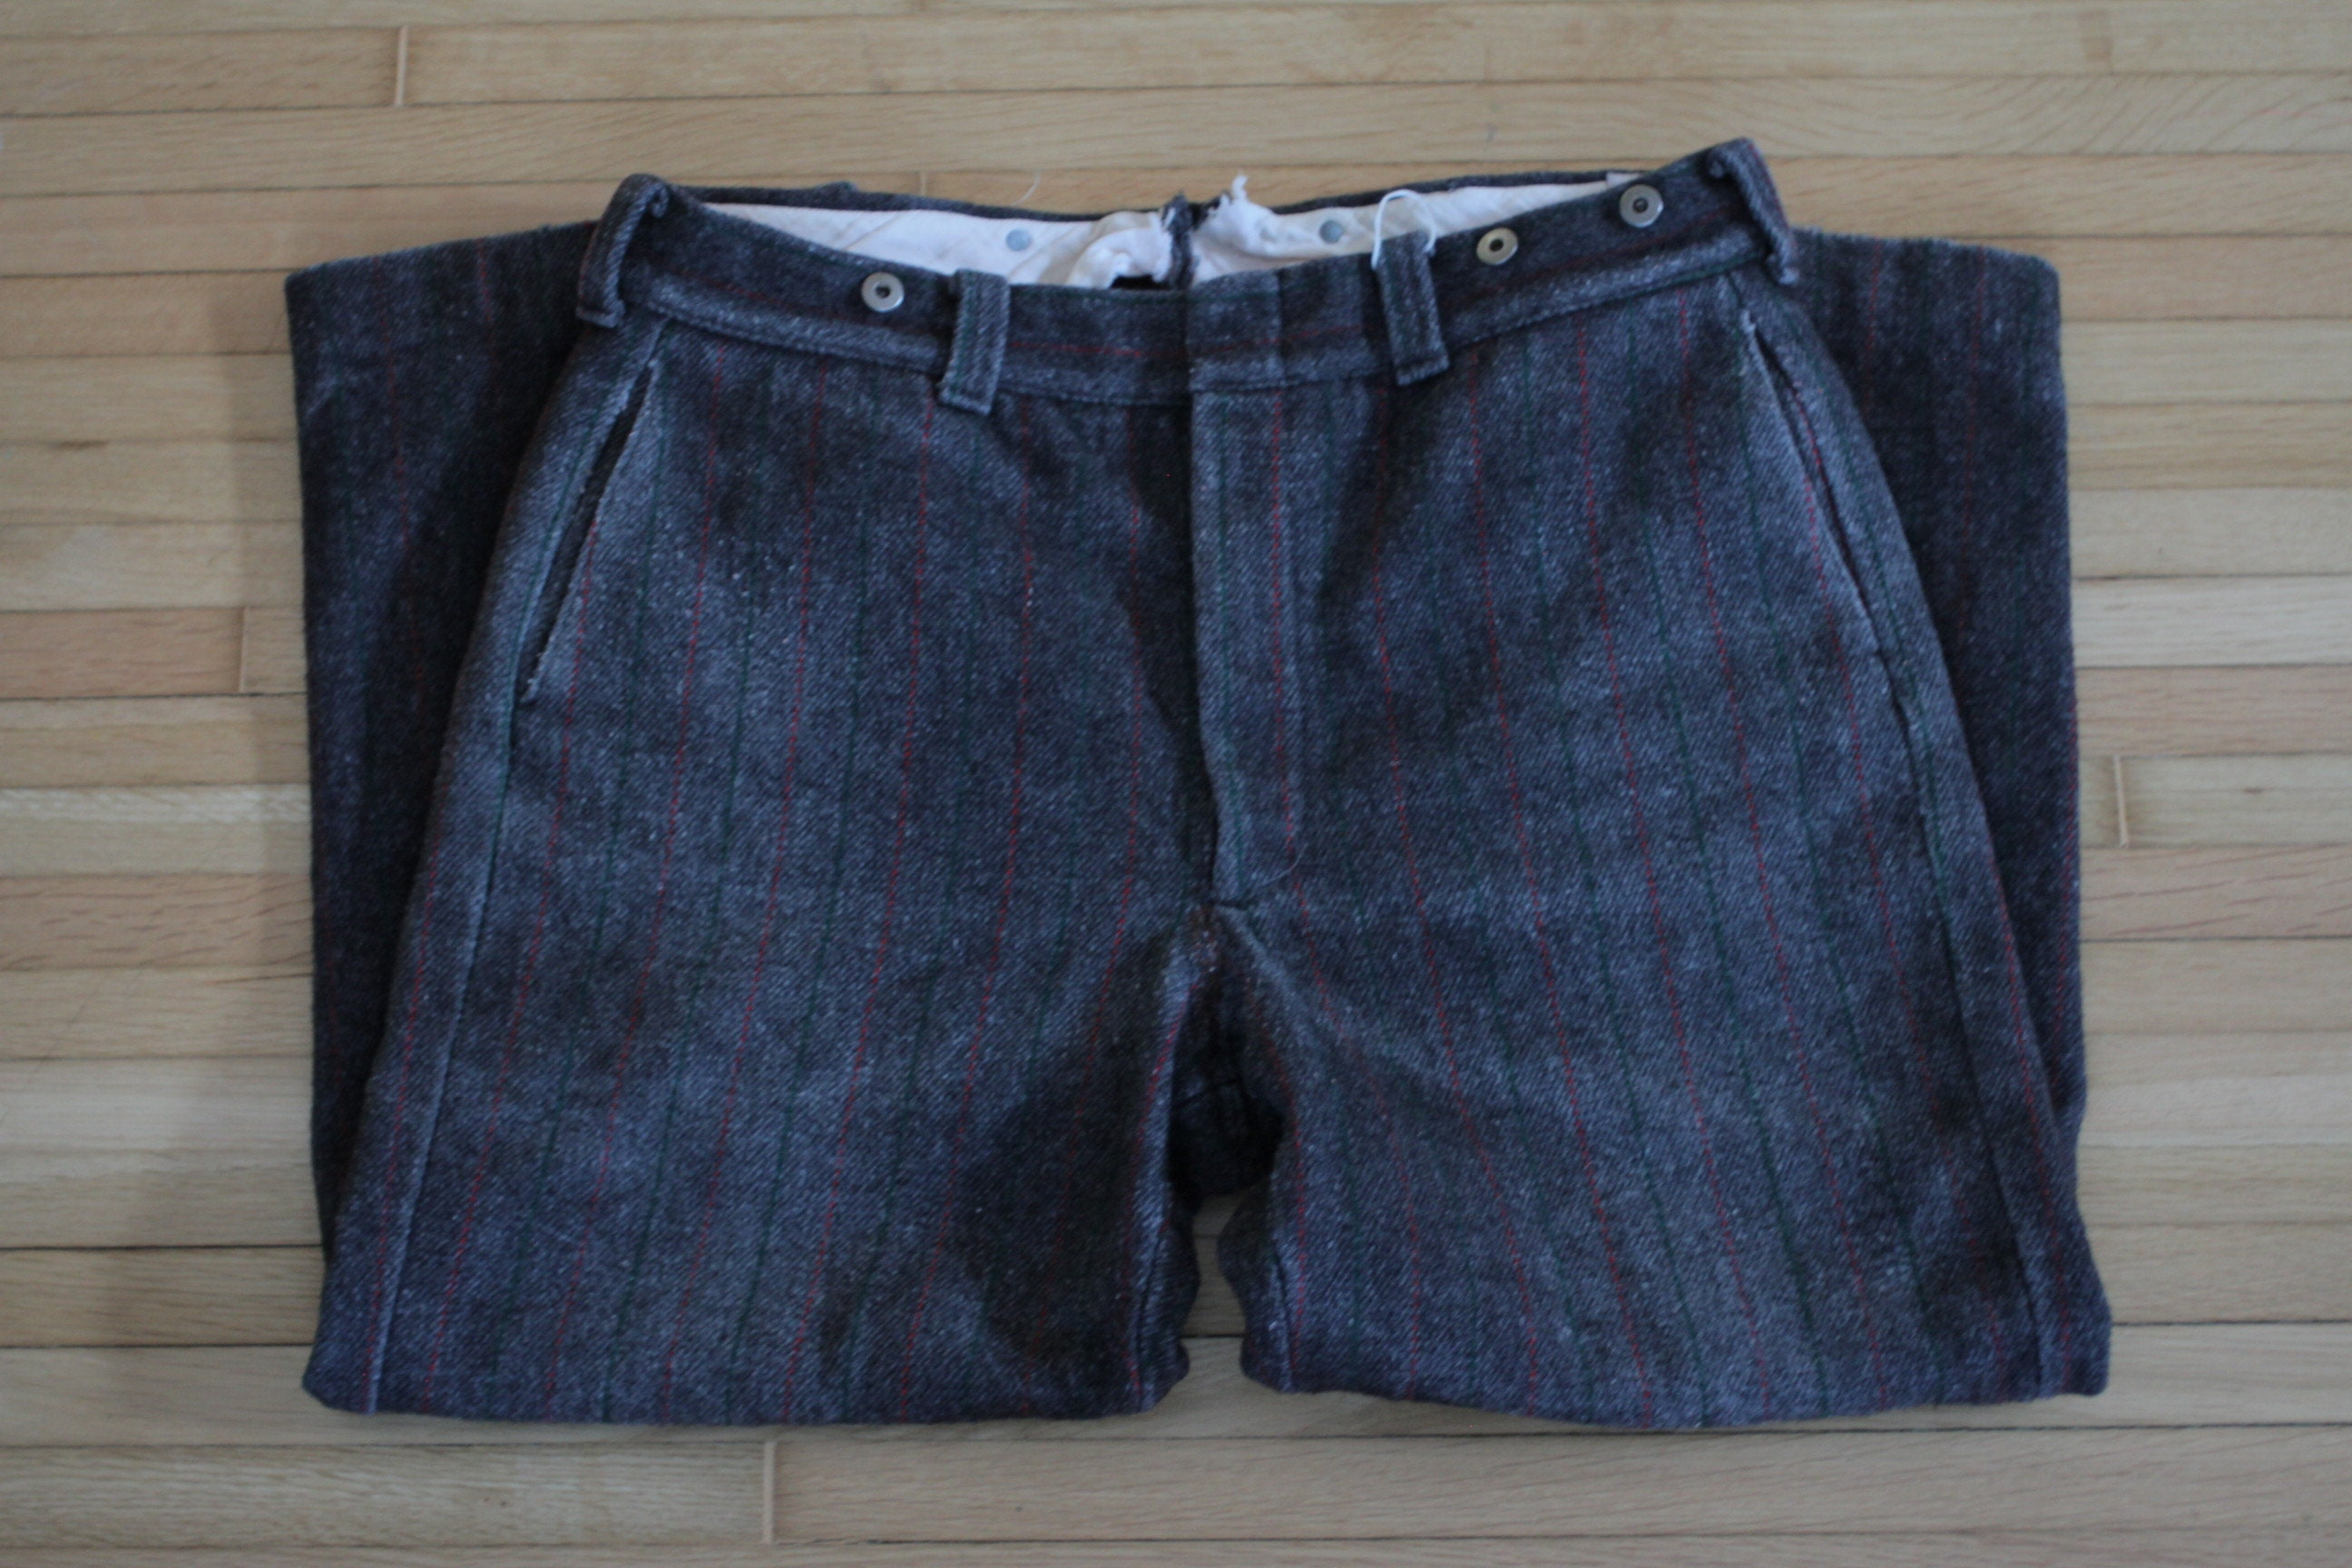 66385138aab0d Vintage Woolrich Wool Hunting Pants / Size 38-40 / Mens Wool | Etsy